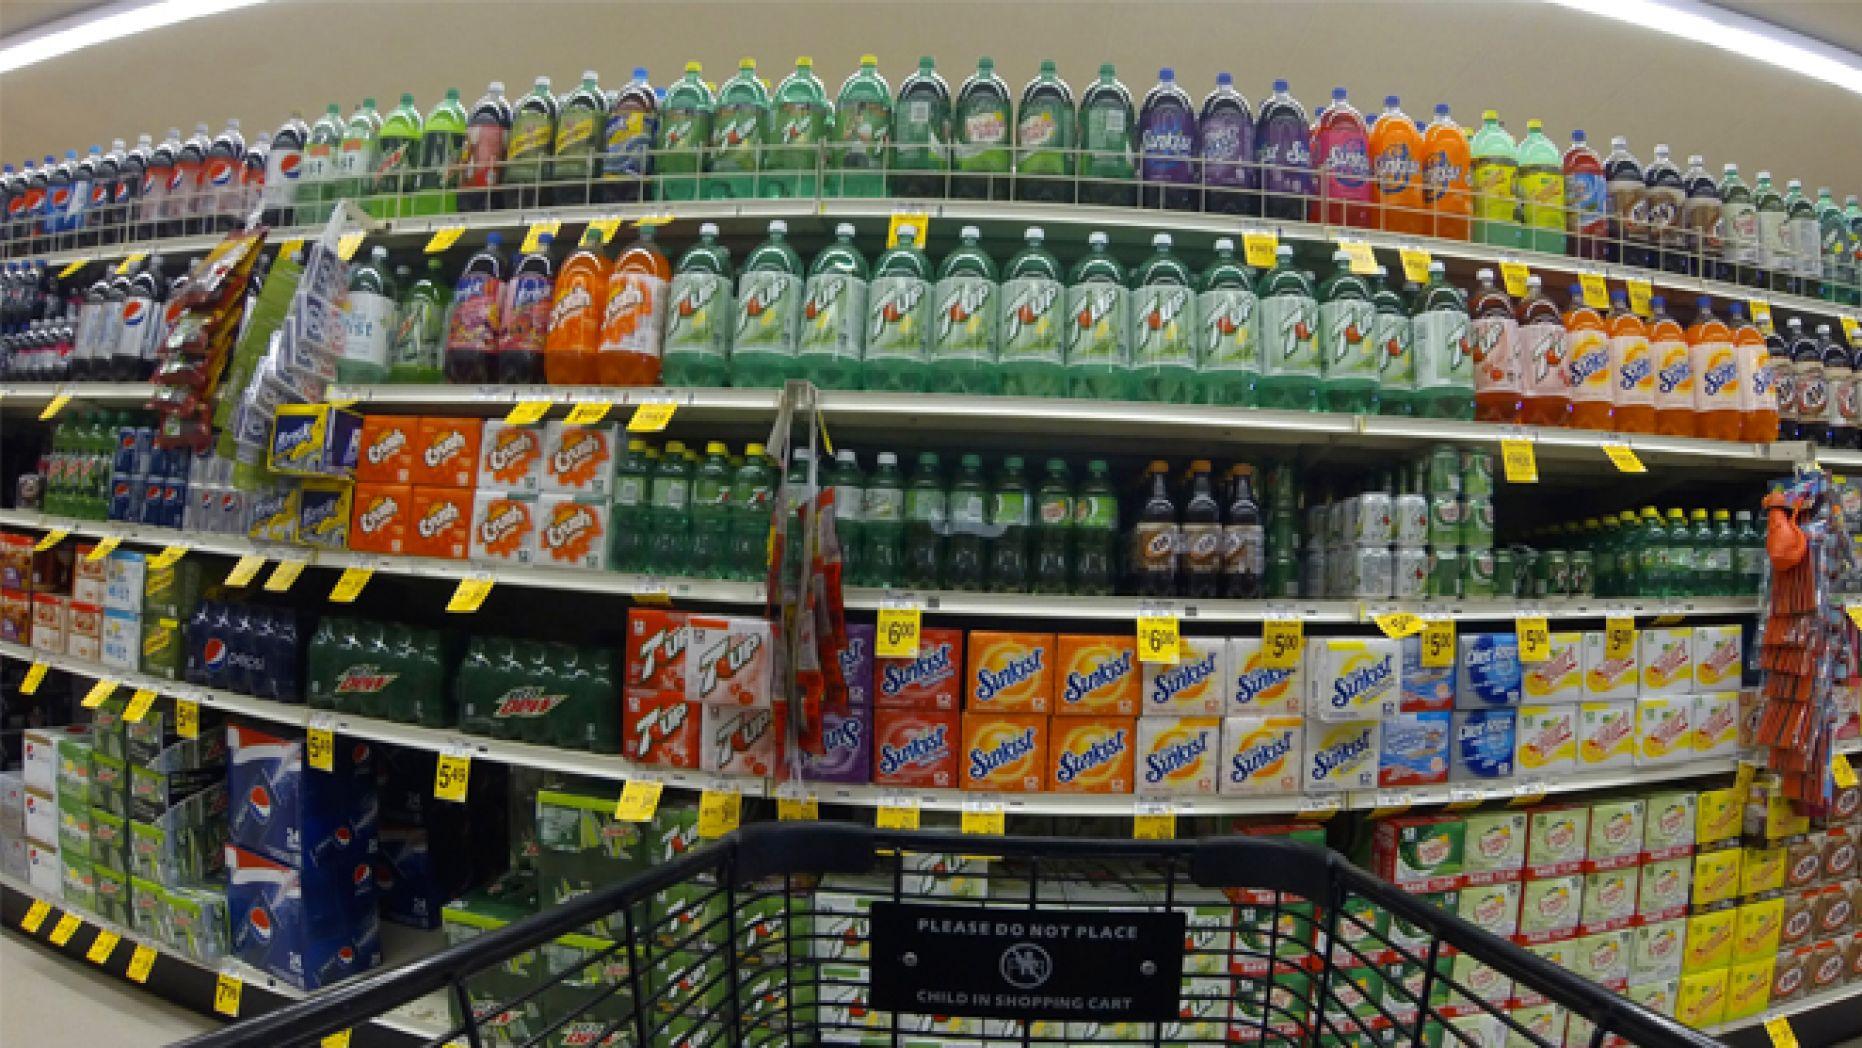 Soda Myths